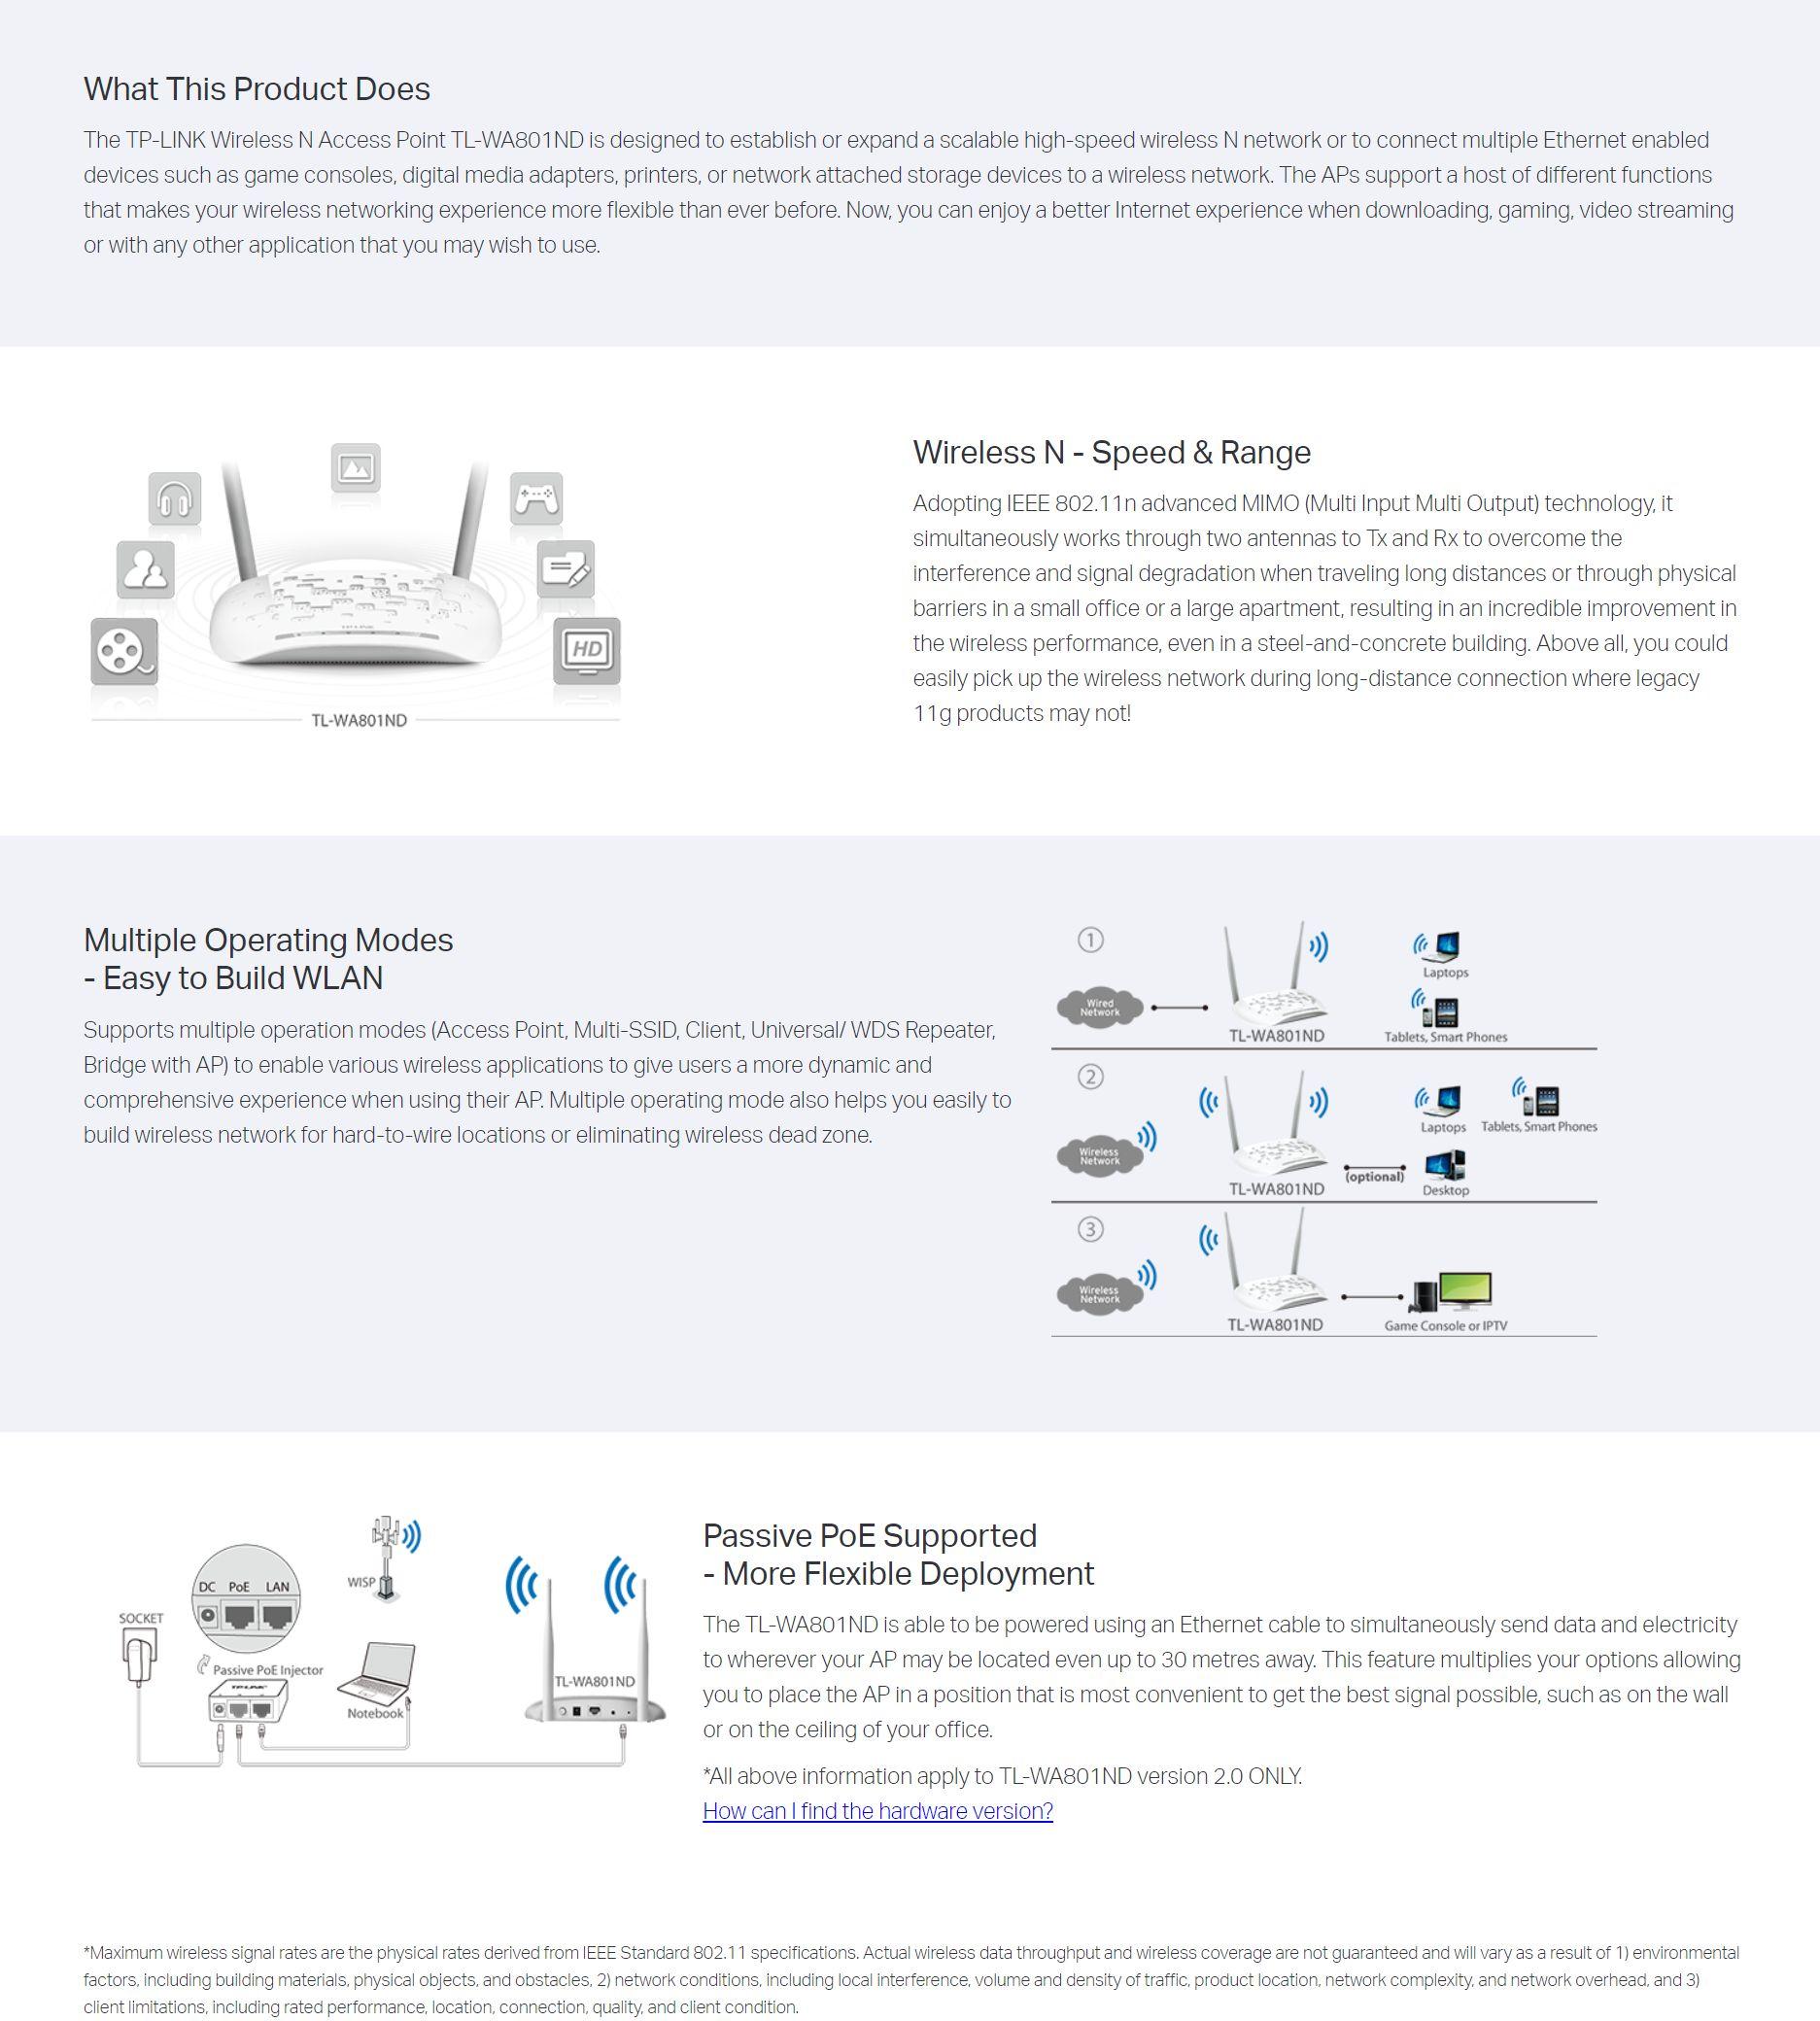 TP-LINK TL-WA801ND Wireless N Access Point